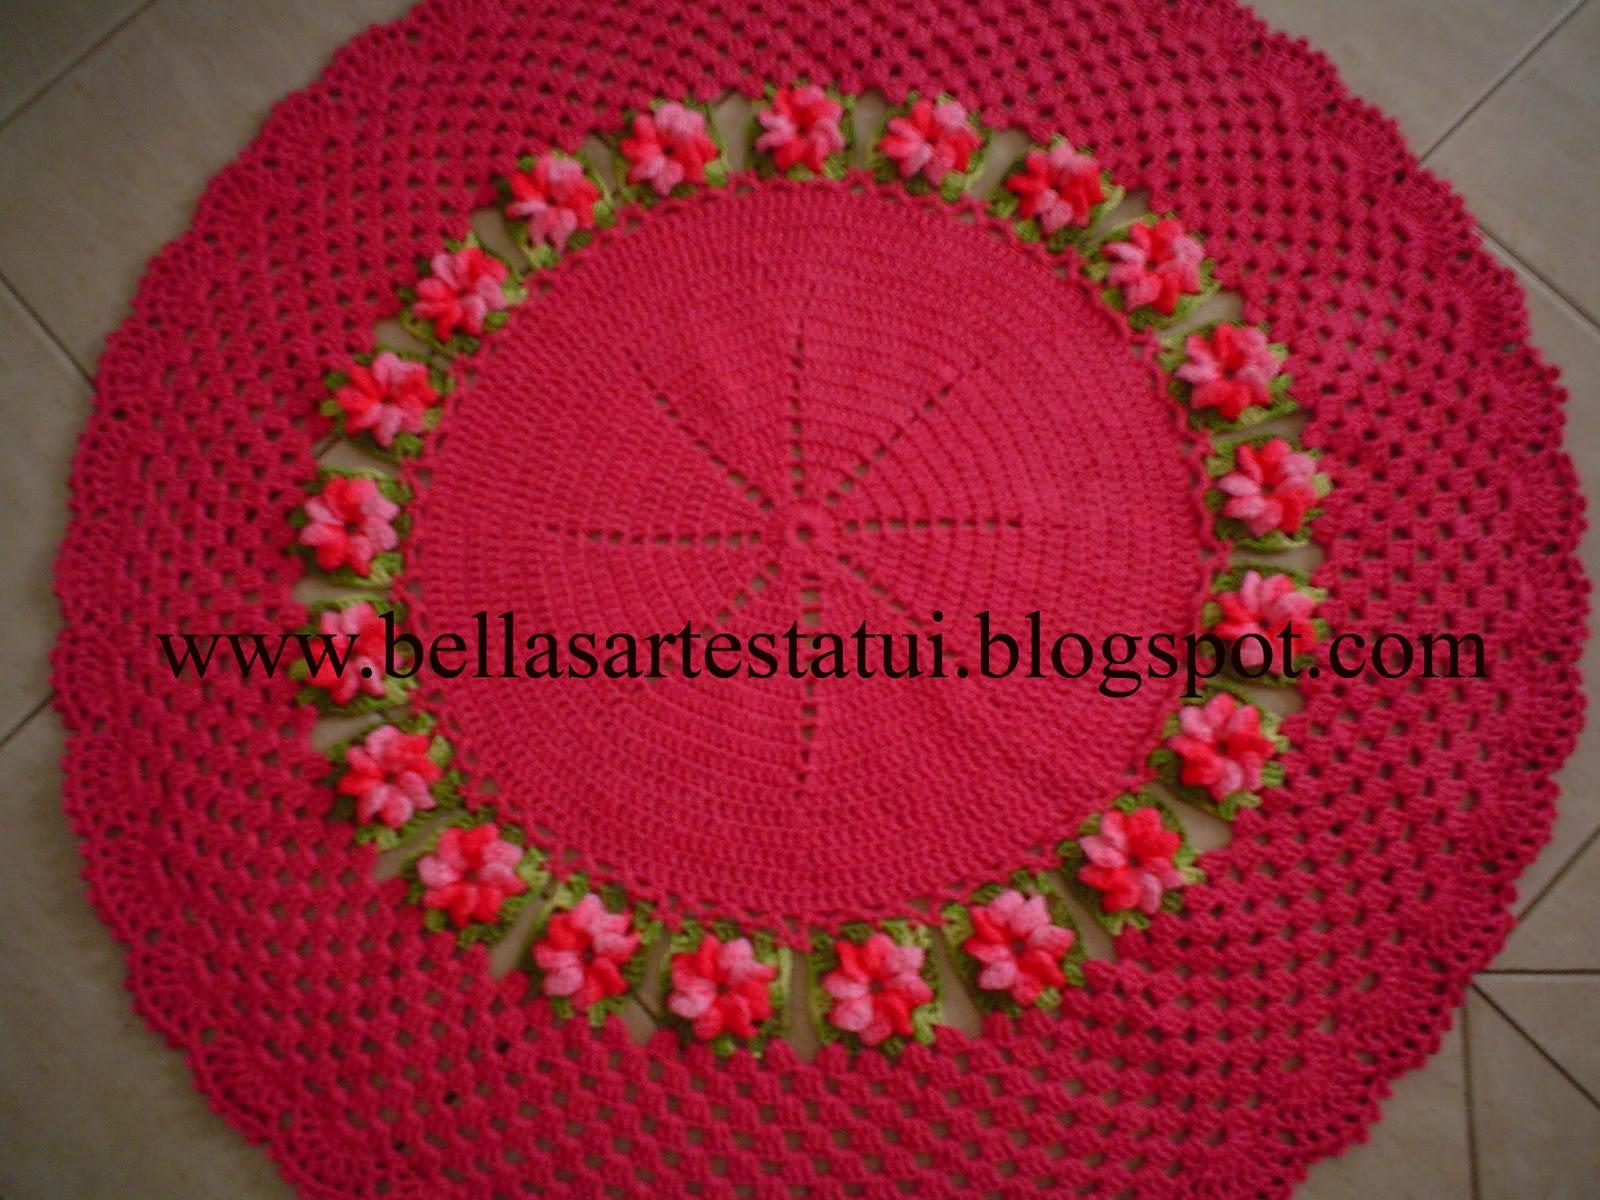 bellas artes tatui tapete croche pink com flores barbante. Black Bedroom Furniture Sets. Home Design Ideas